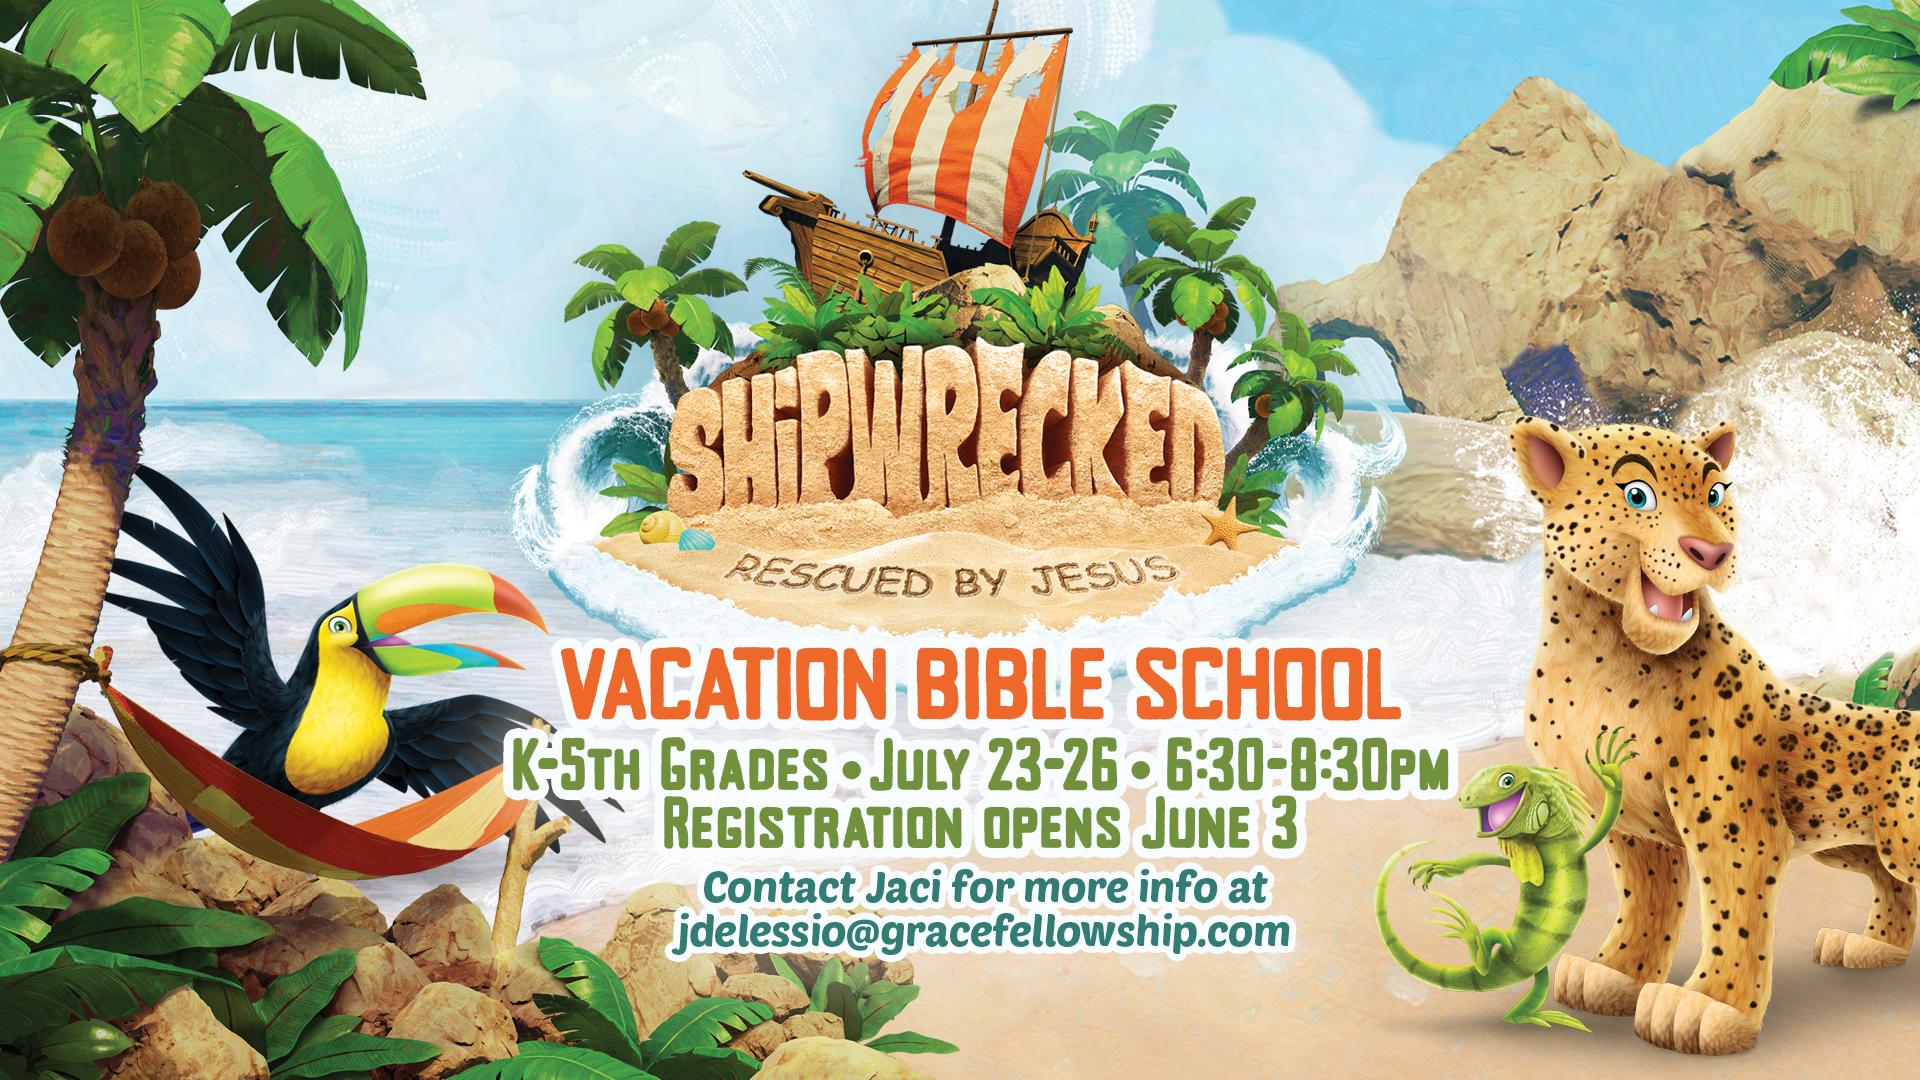 Saratoga Vacation Bible School